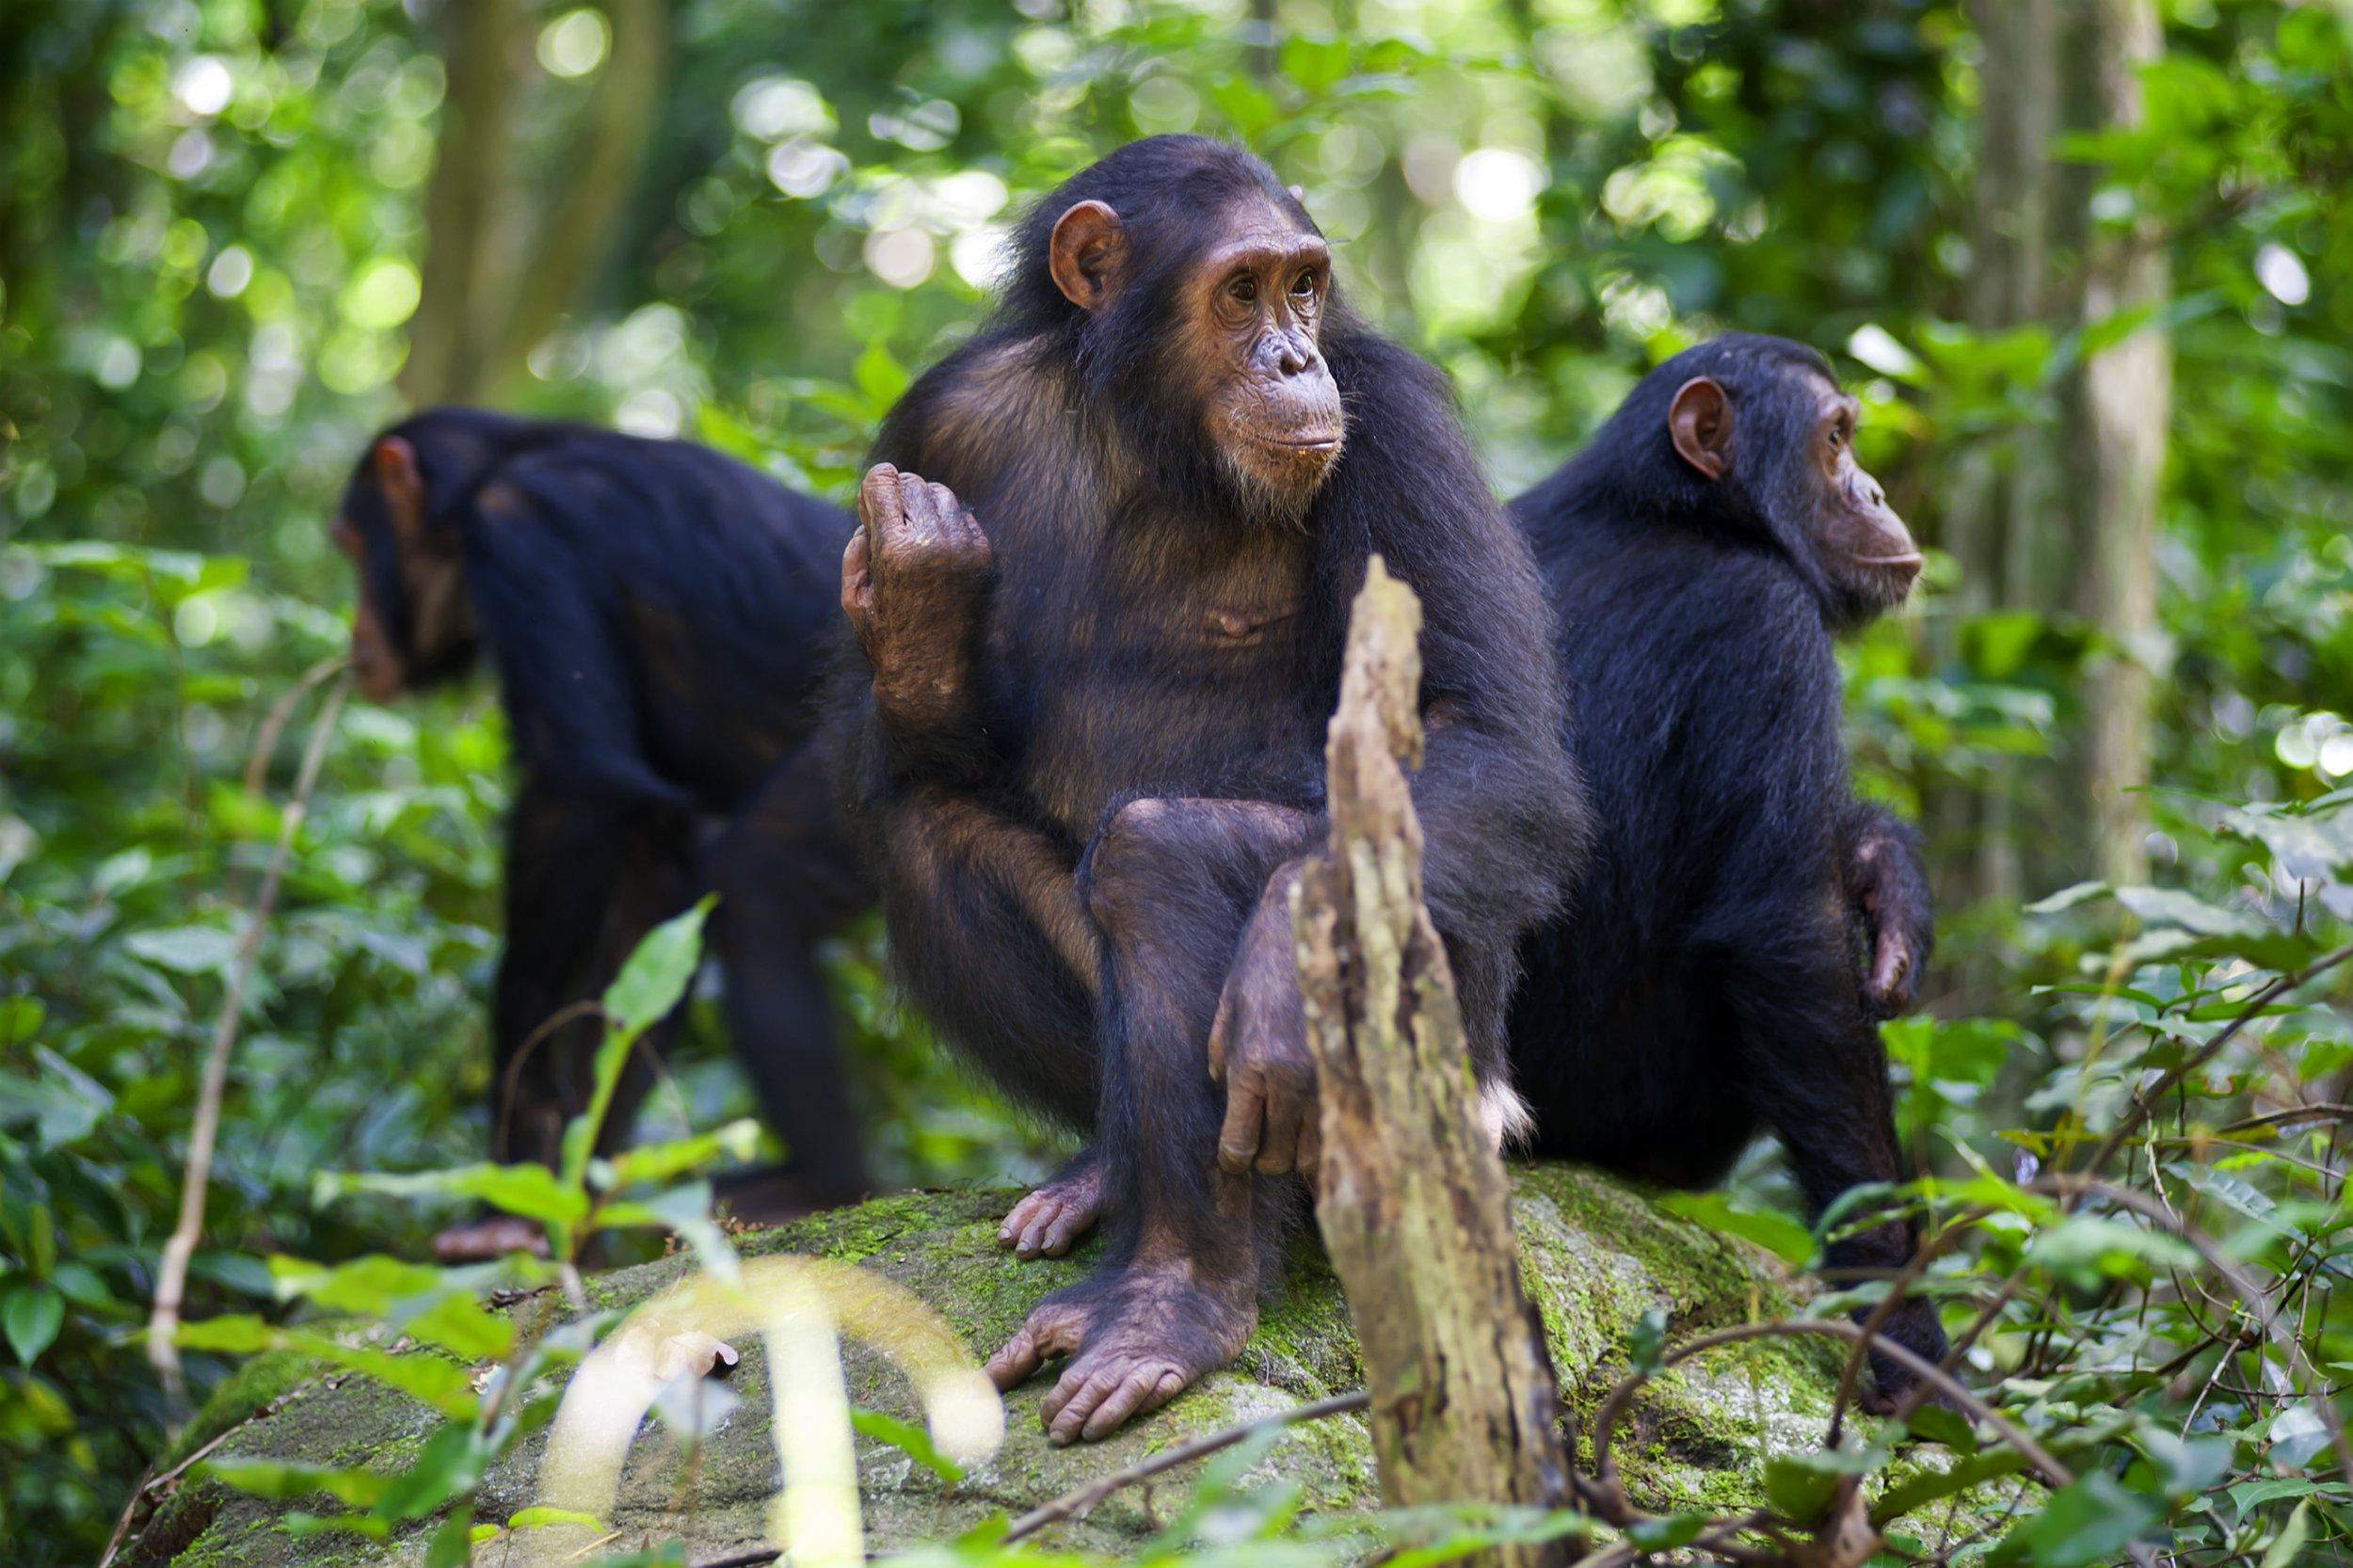 Human encroachment is damaging chimpanzee culture, scientists warn